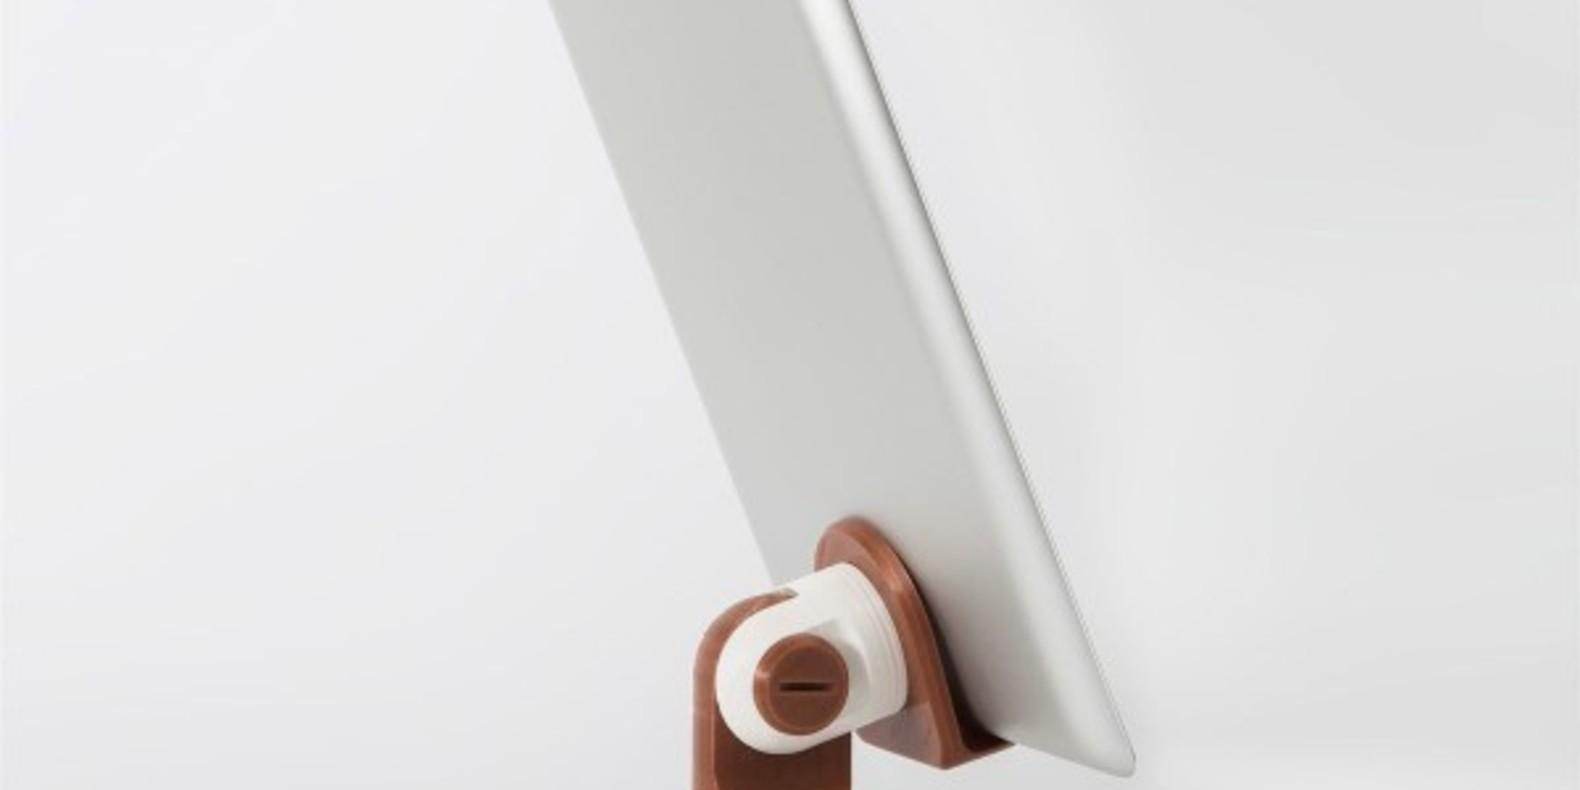 http://fichier3d.fr/wp-content/uploads/2016/04/lampe-porte-casque-capsules-nespresso-ipad-eumakers-bobines-spools-filament-impression-3D-fichier-3D-eumakeit-STL-cults-6.jpg